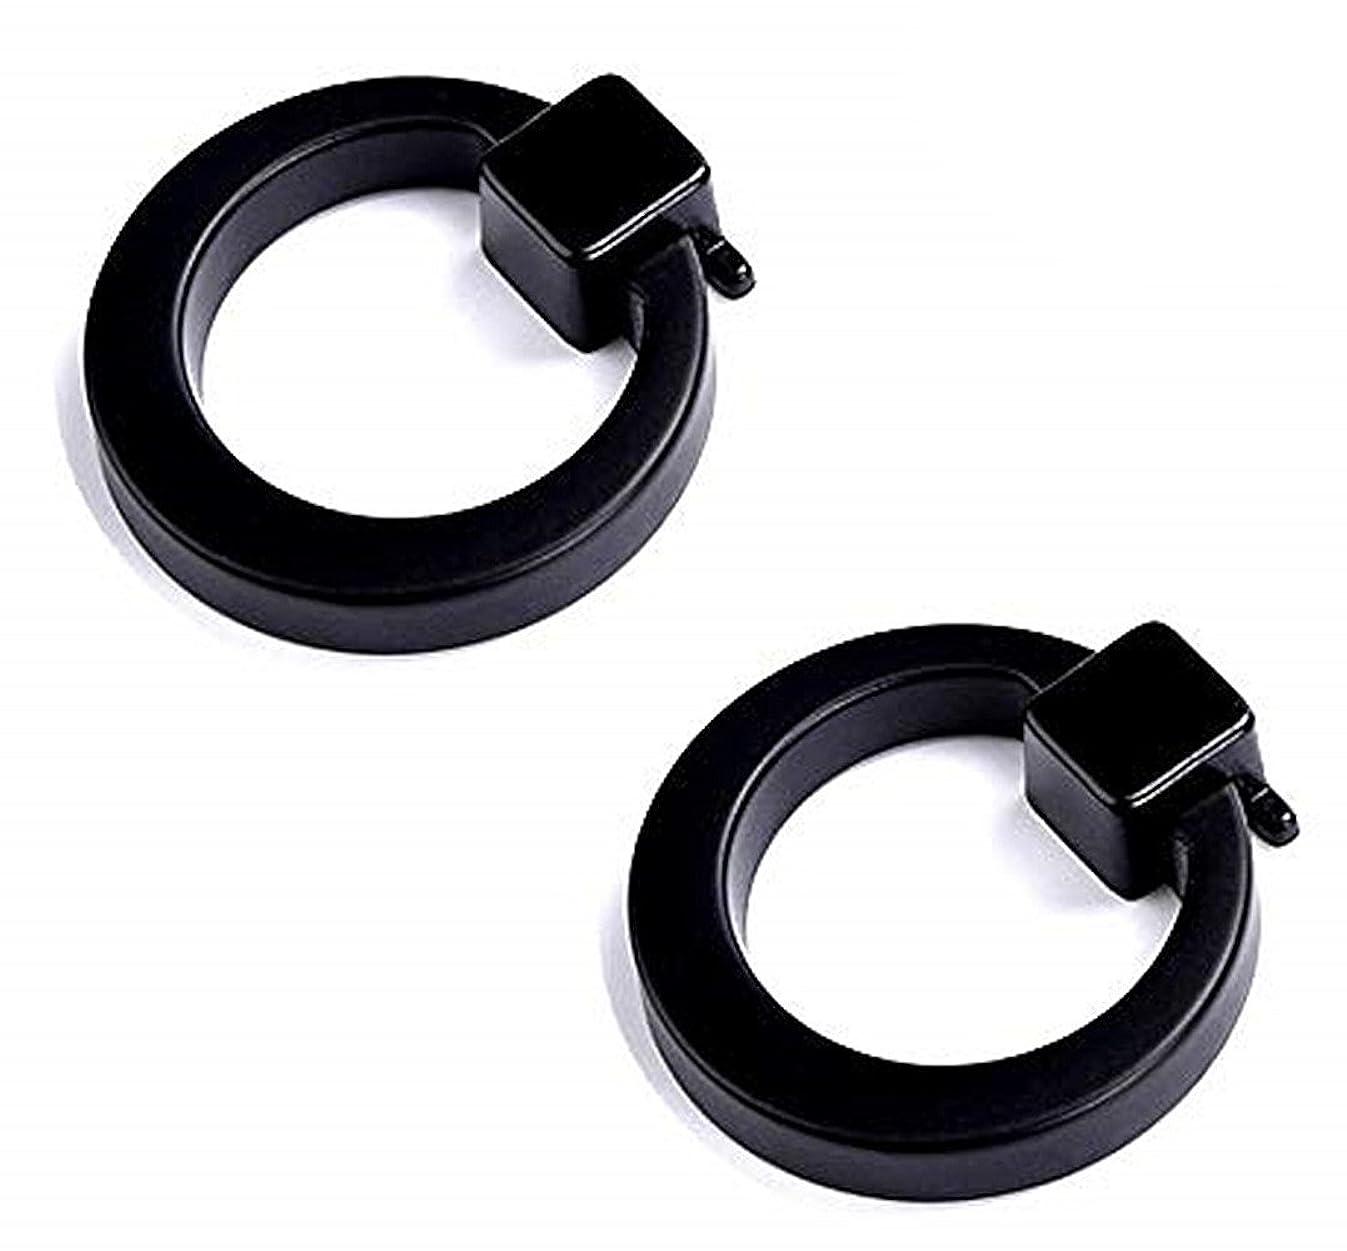 SamIdea 2-Count European Ring Door Pull Handles for Cabinet Drawer Dresser Cupboard Wardrobe,Black